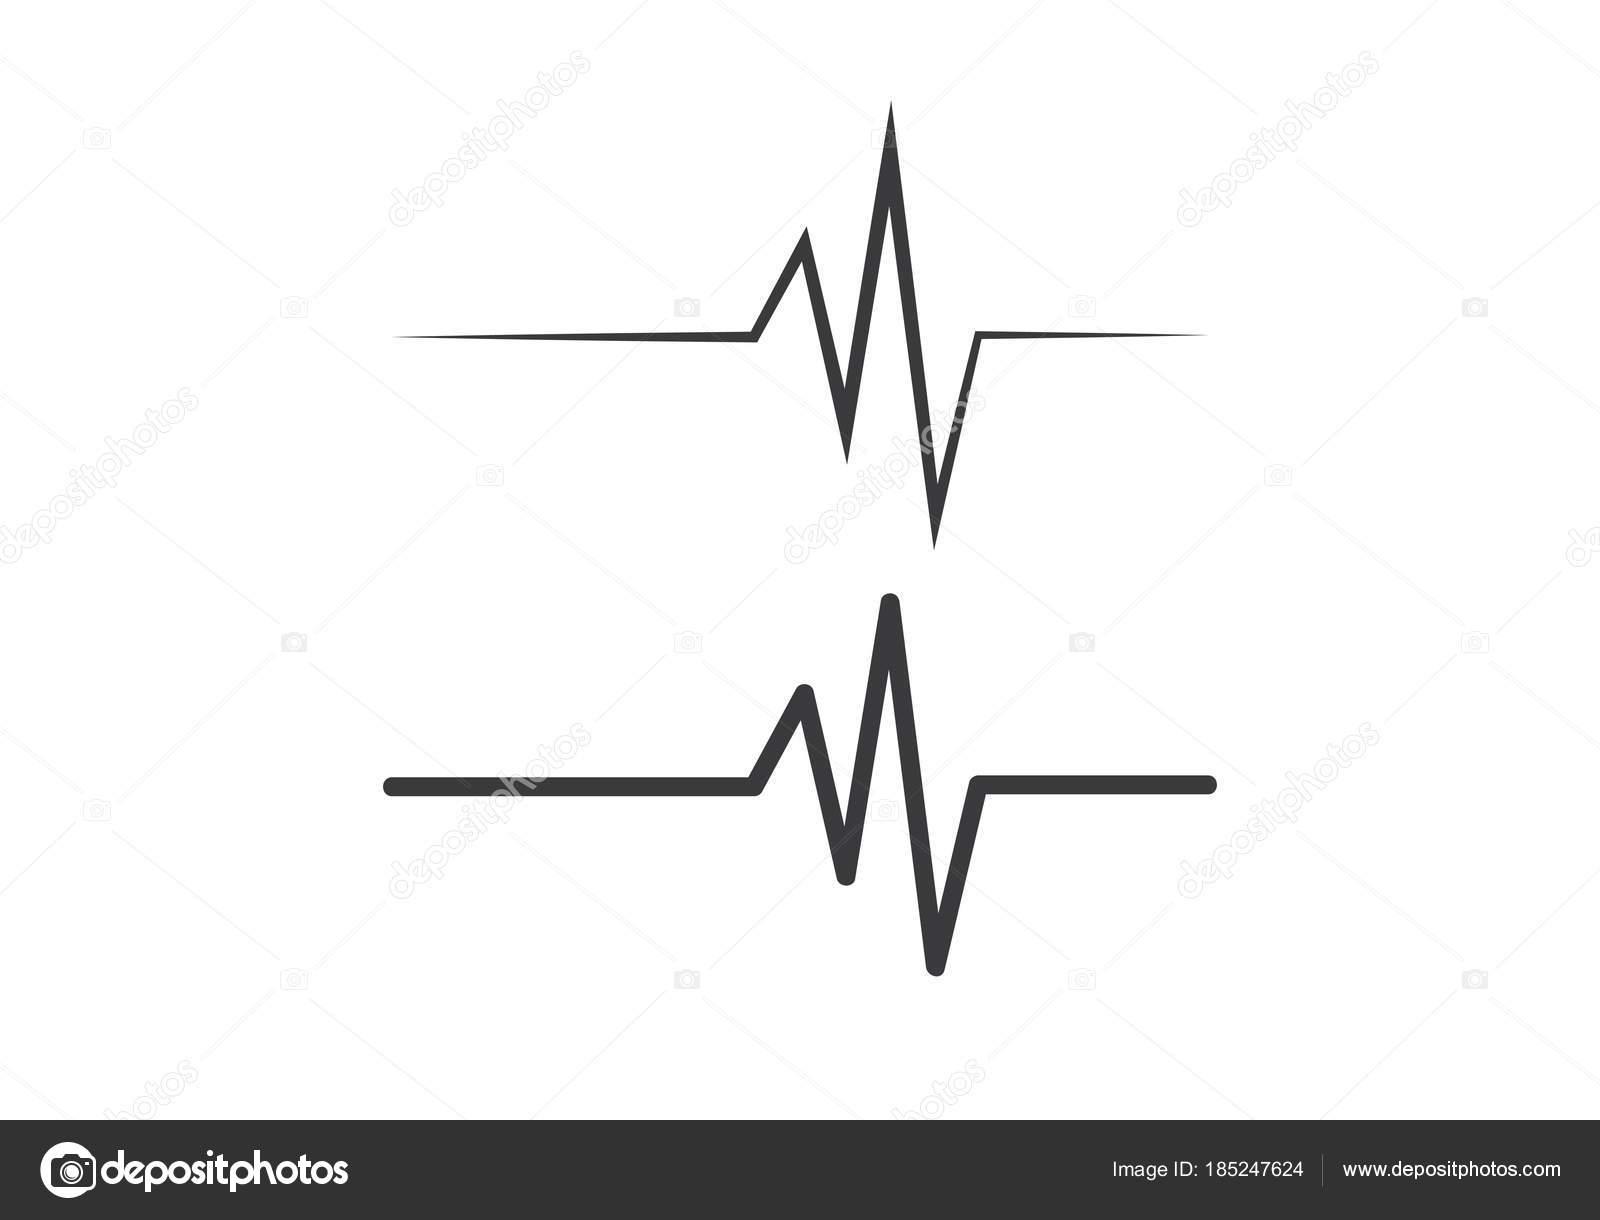 Heartbeat Line Art : Heartbeat pulse vector u stock elaelo